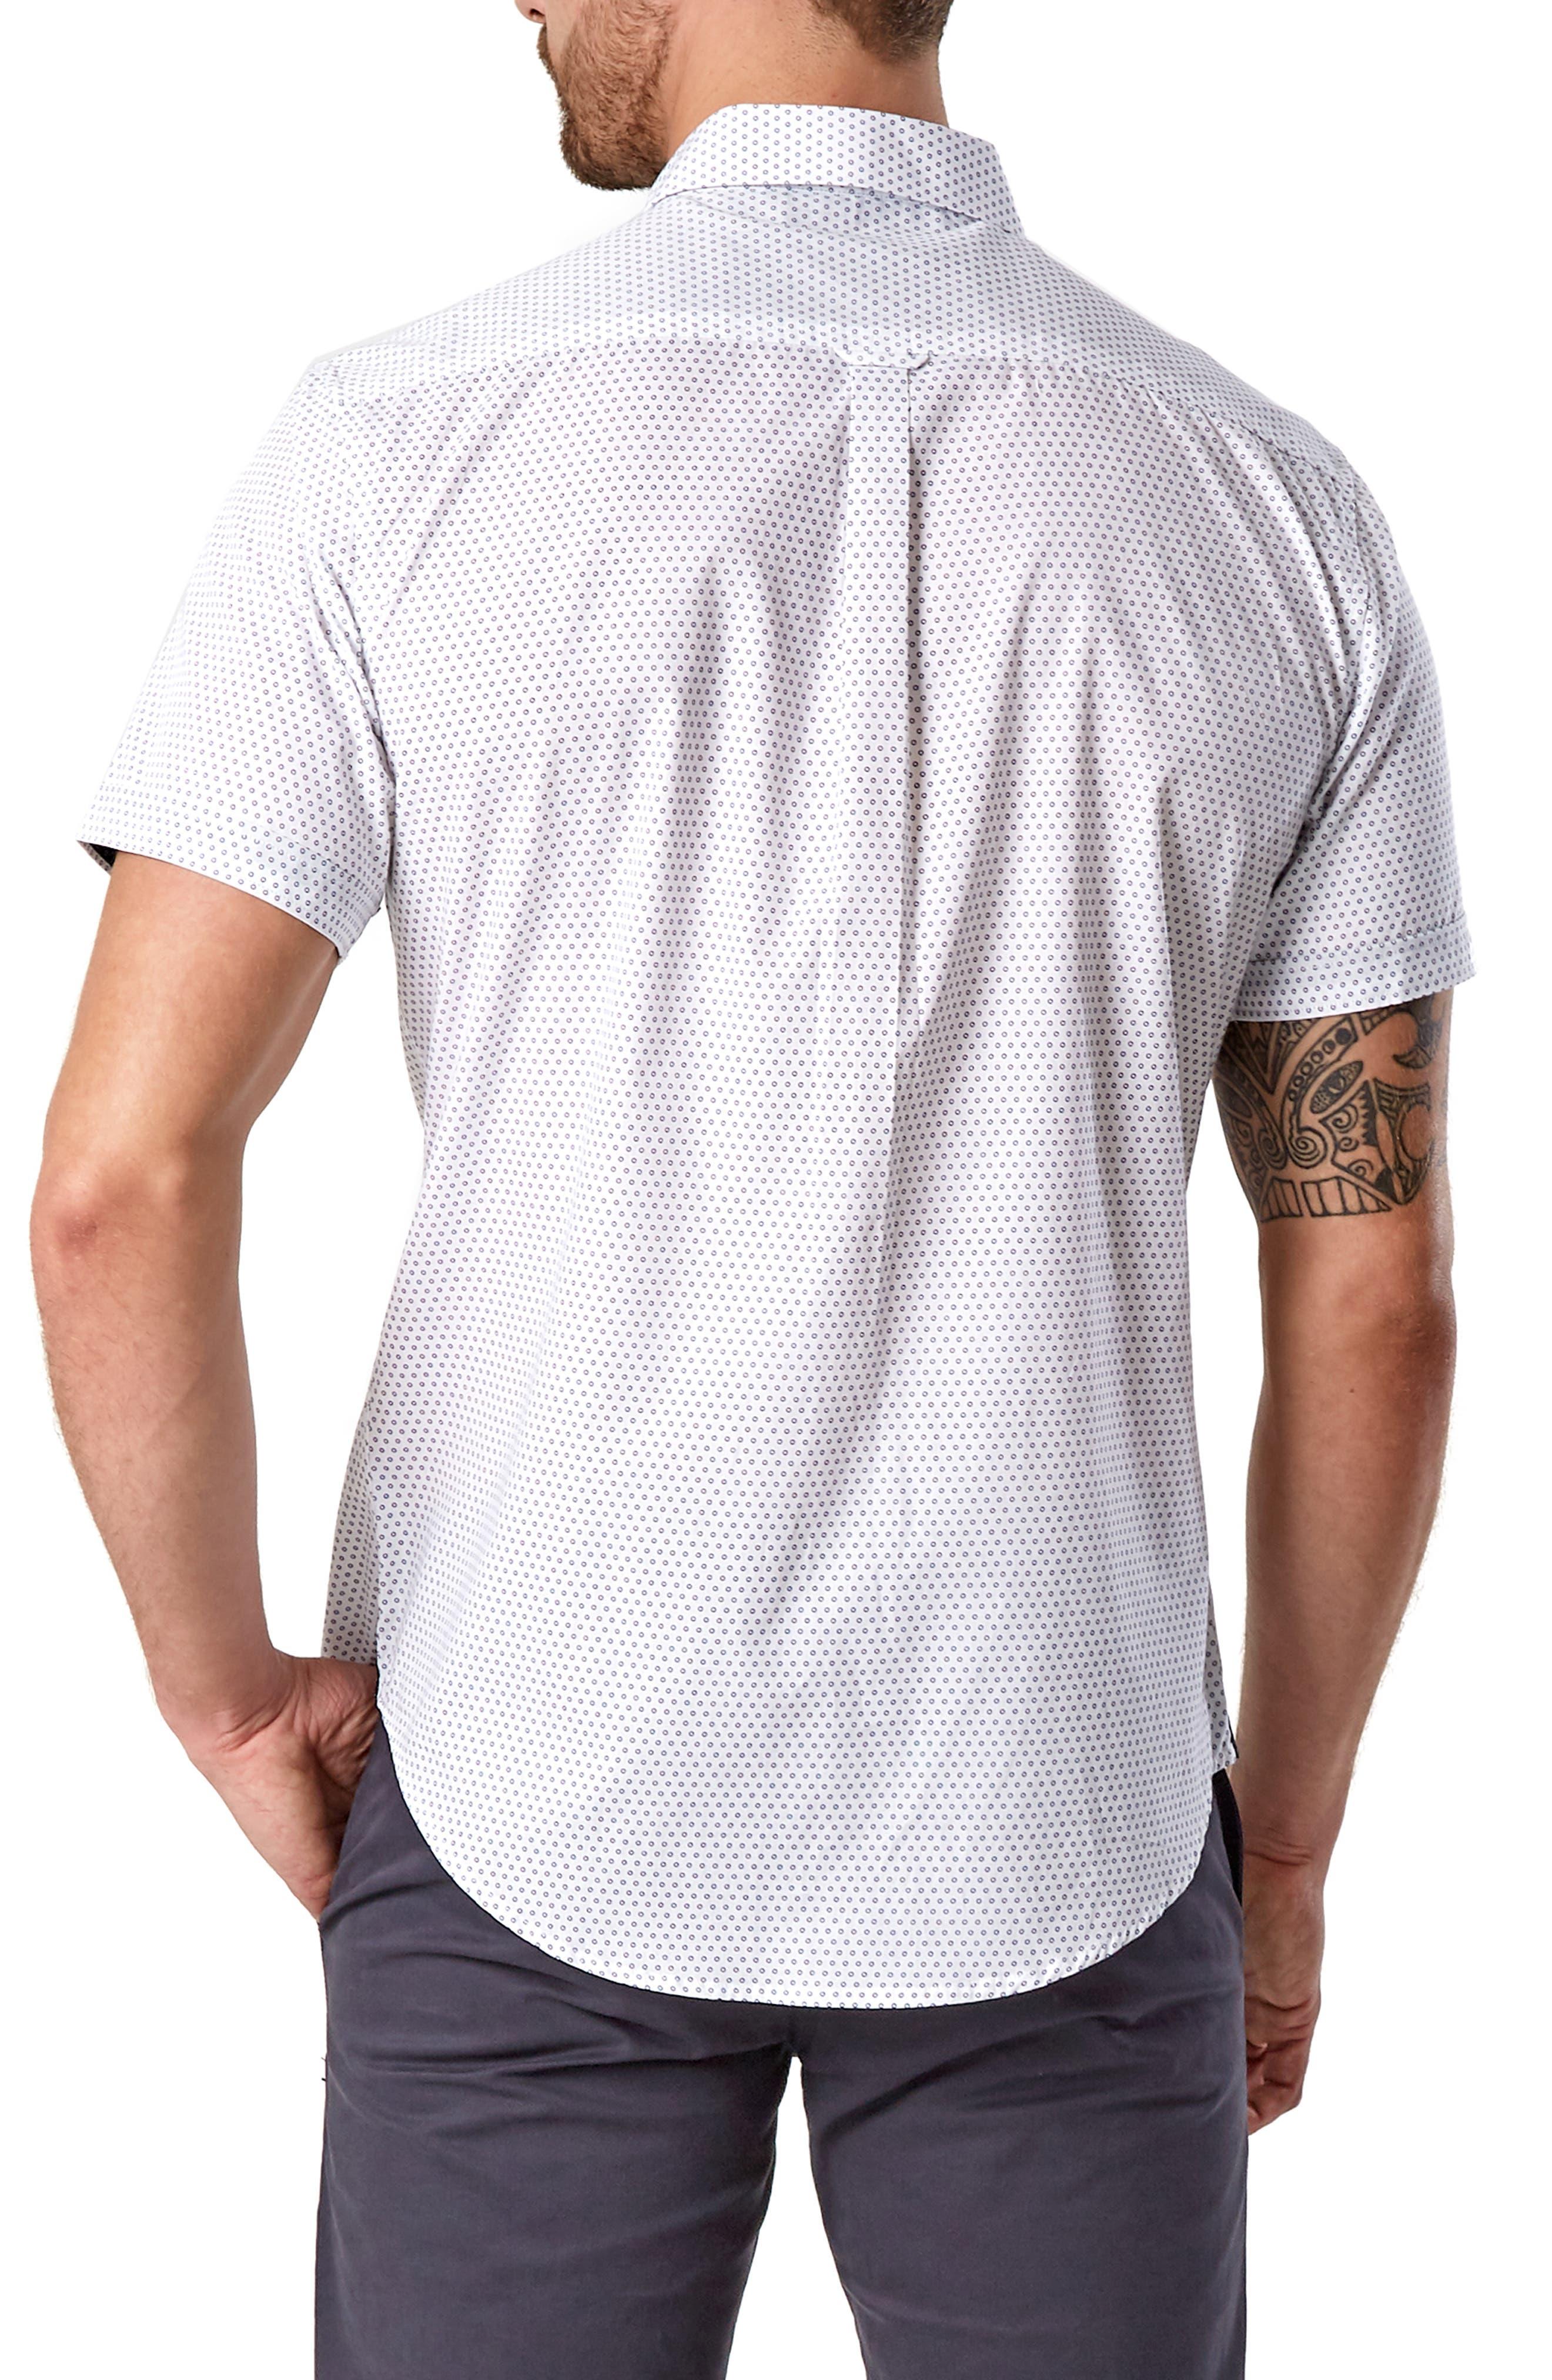 Suavecito Slim Fit Sport Shirt,                             Alternate thumbnail 3, color,                             WHITE